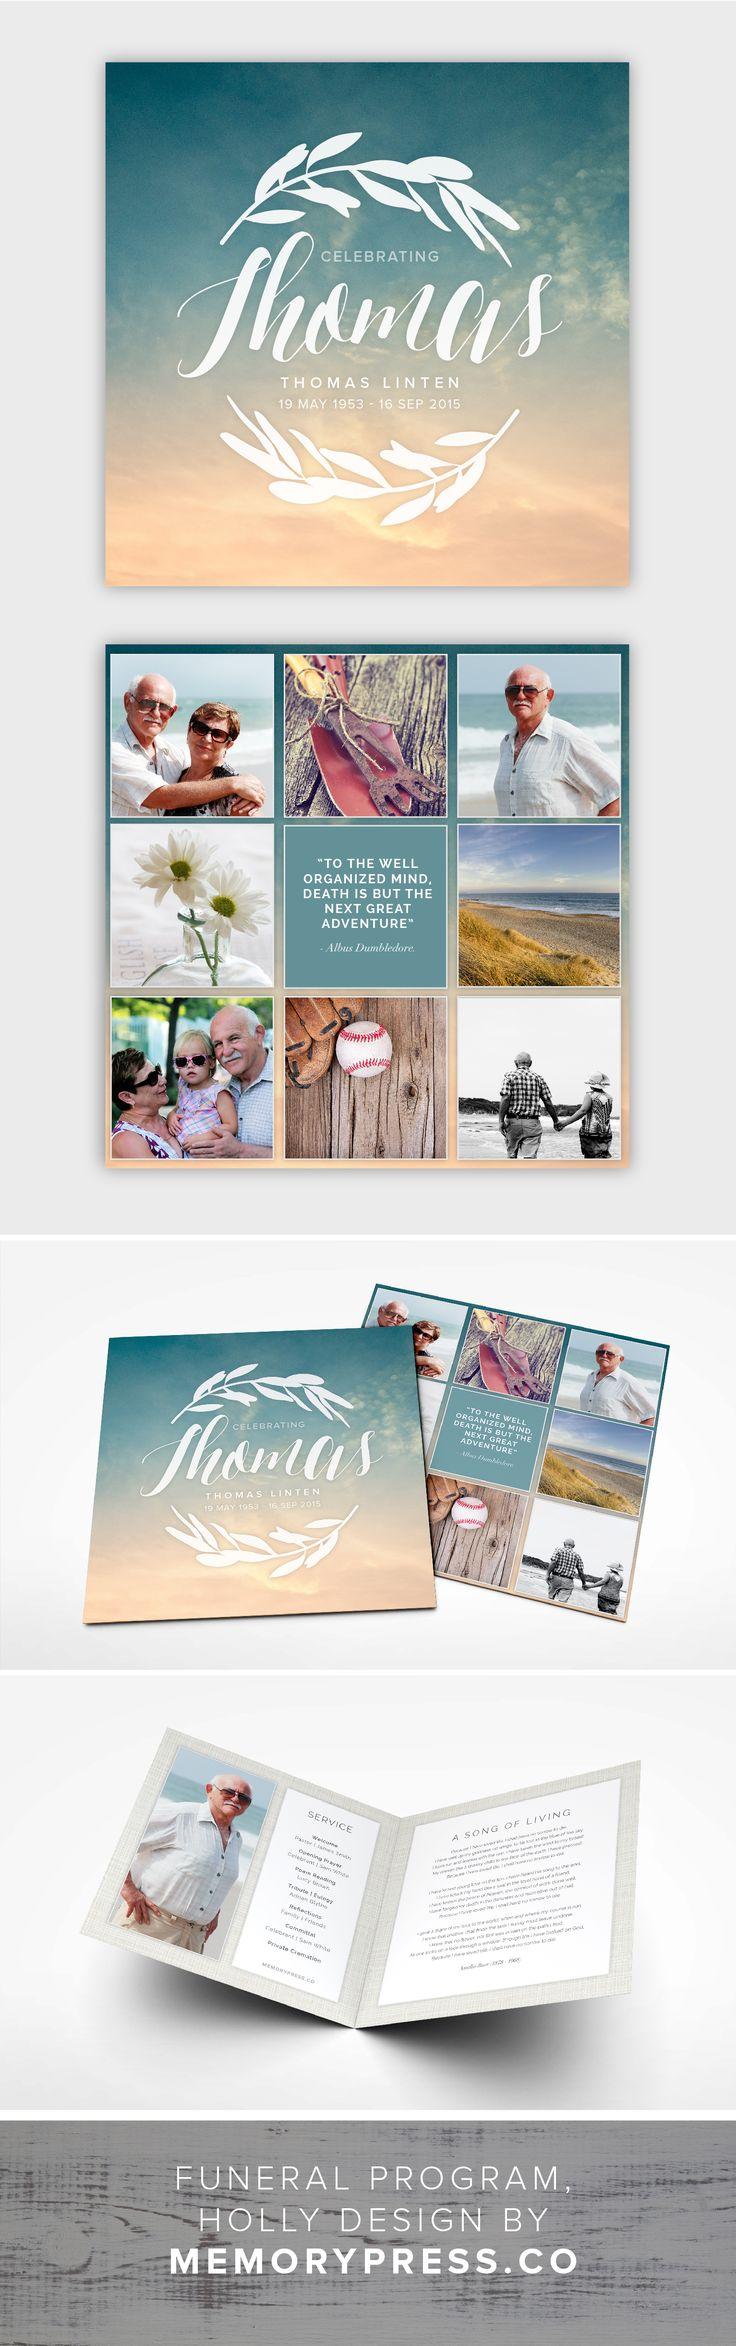 79 best images about funeral program templates for ms word to download on pinterest program. Black Bedroom Furniture Sets. Home Design Ideas